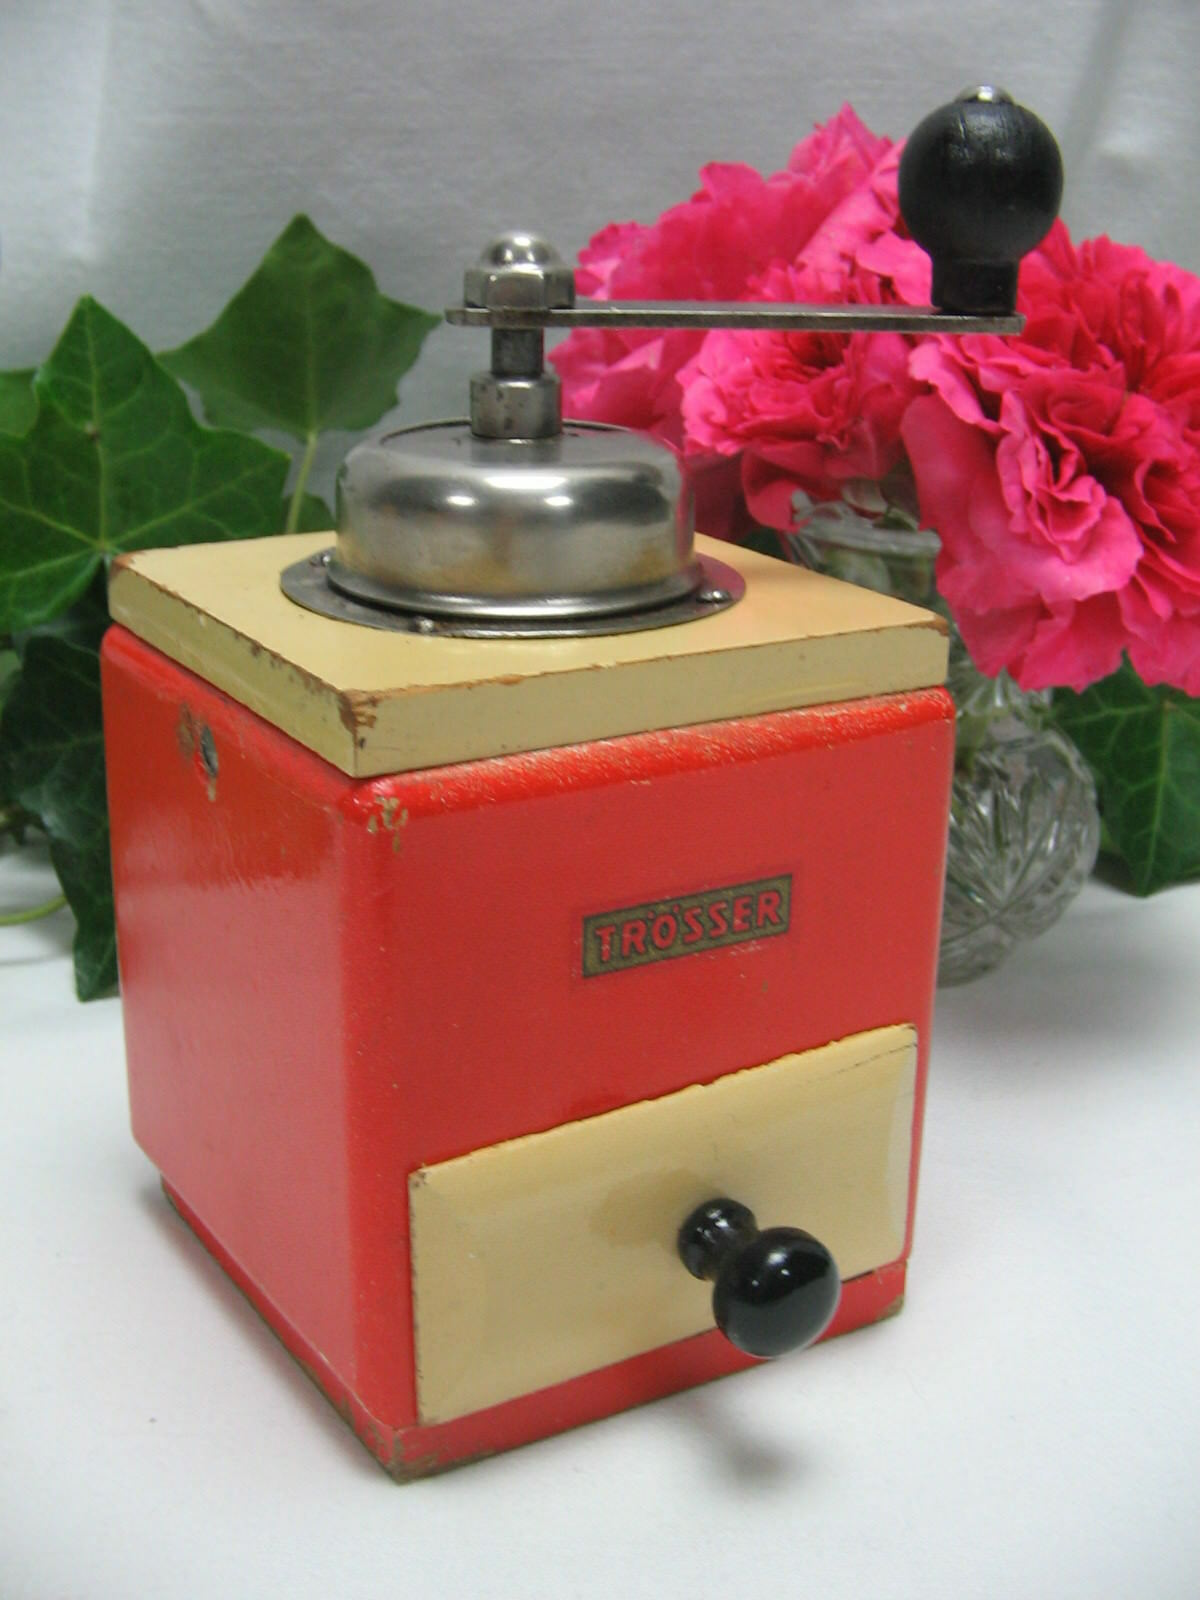 outlet Trösser Caffè Mulino MOKA MULINO bambole Tube coffee grinder grinder grinder mill MOULIN A CAFE  profitto zero